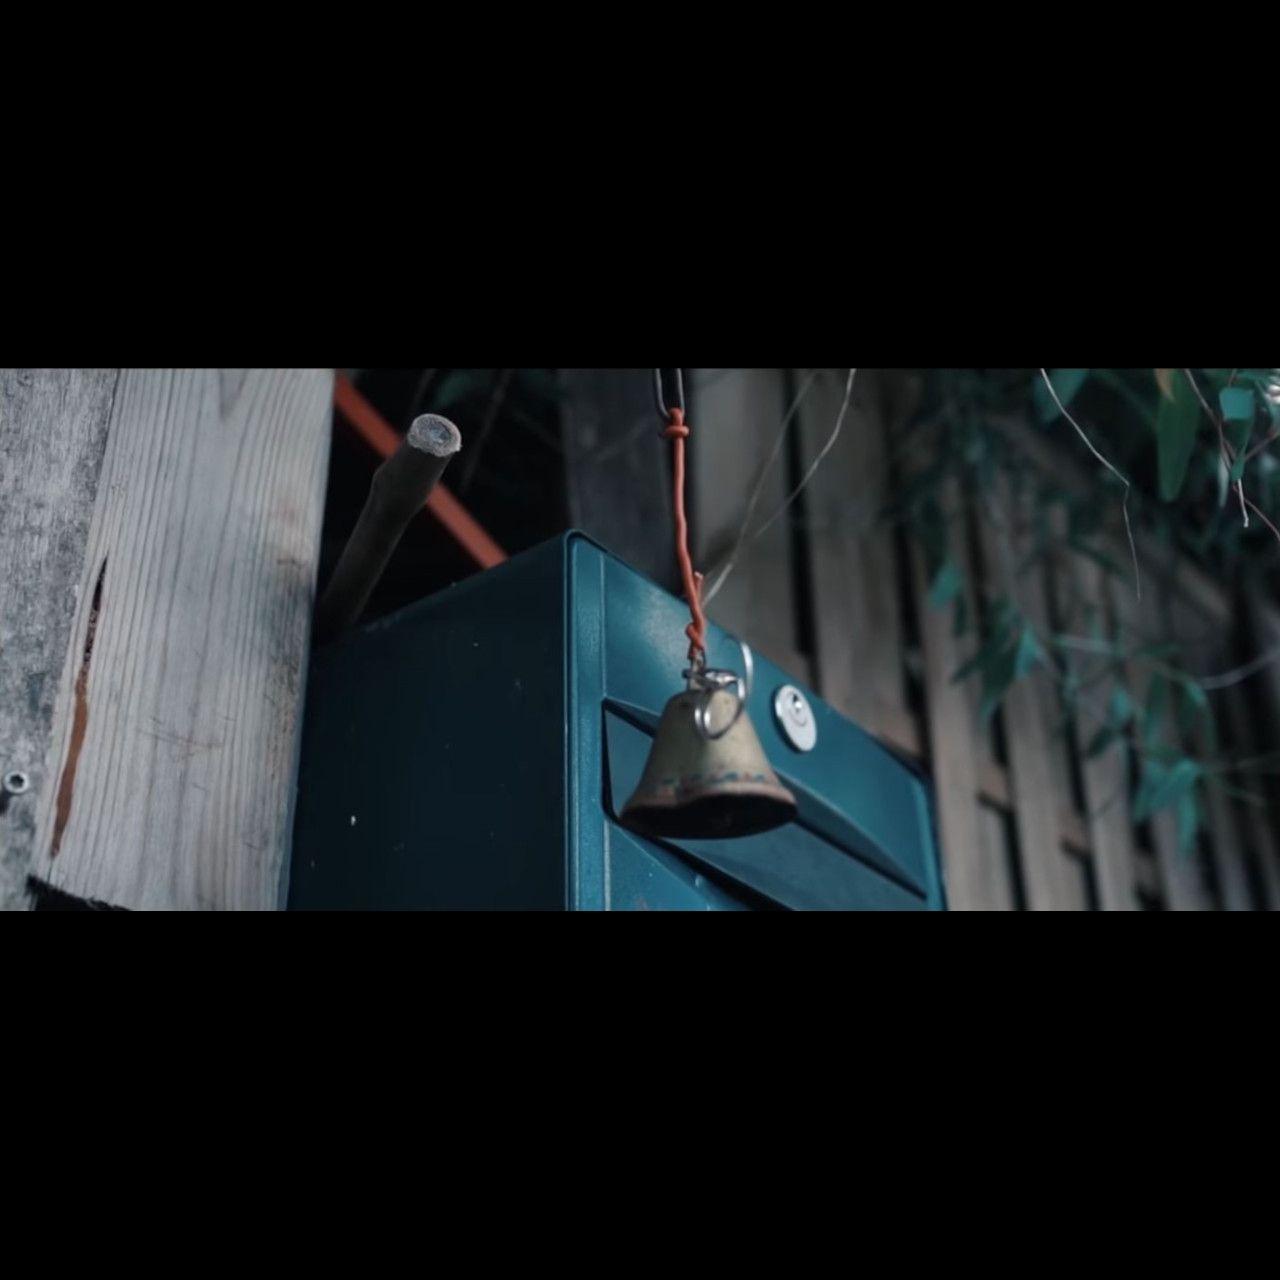 Celas - Buenas noches (ft. Marsman) (Thumbnail)